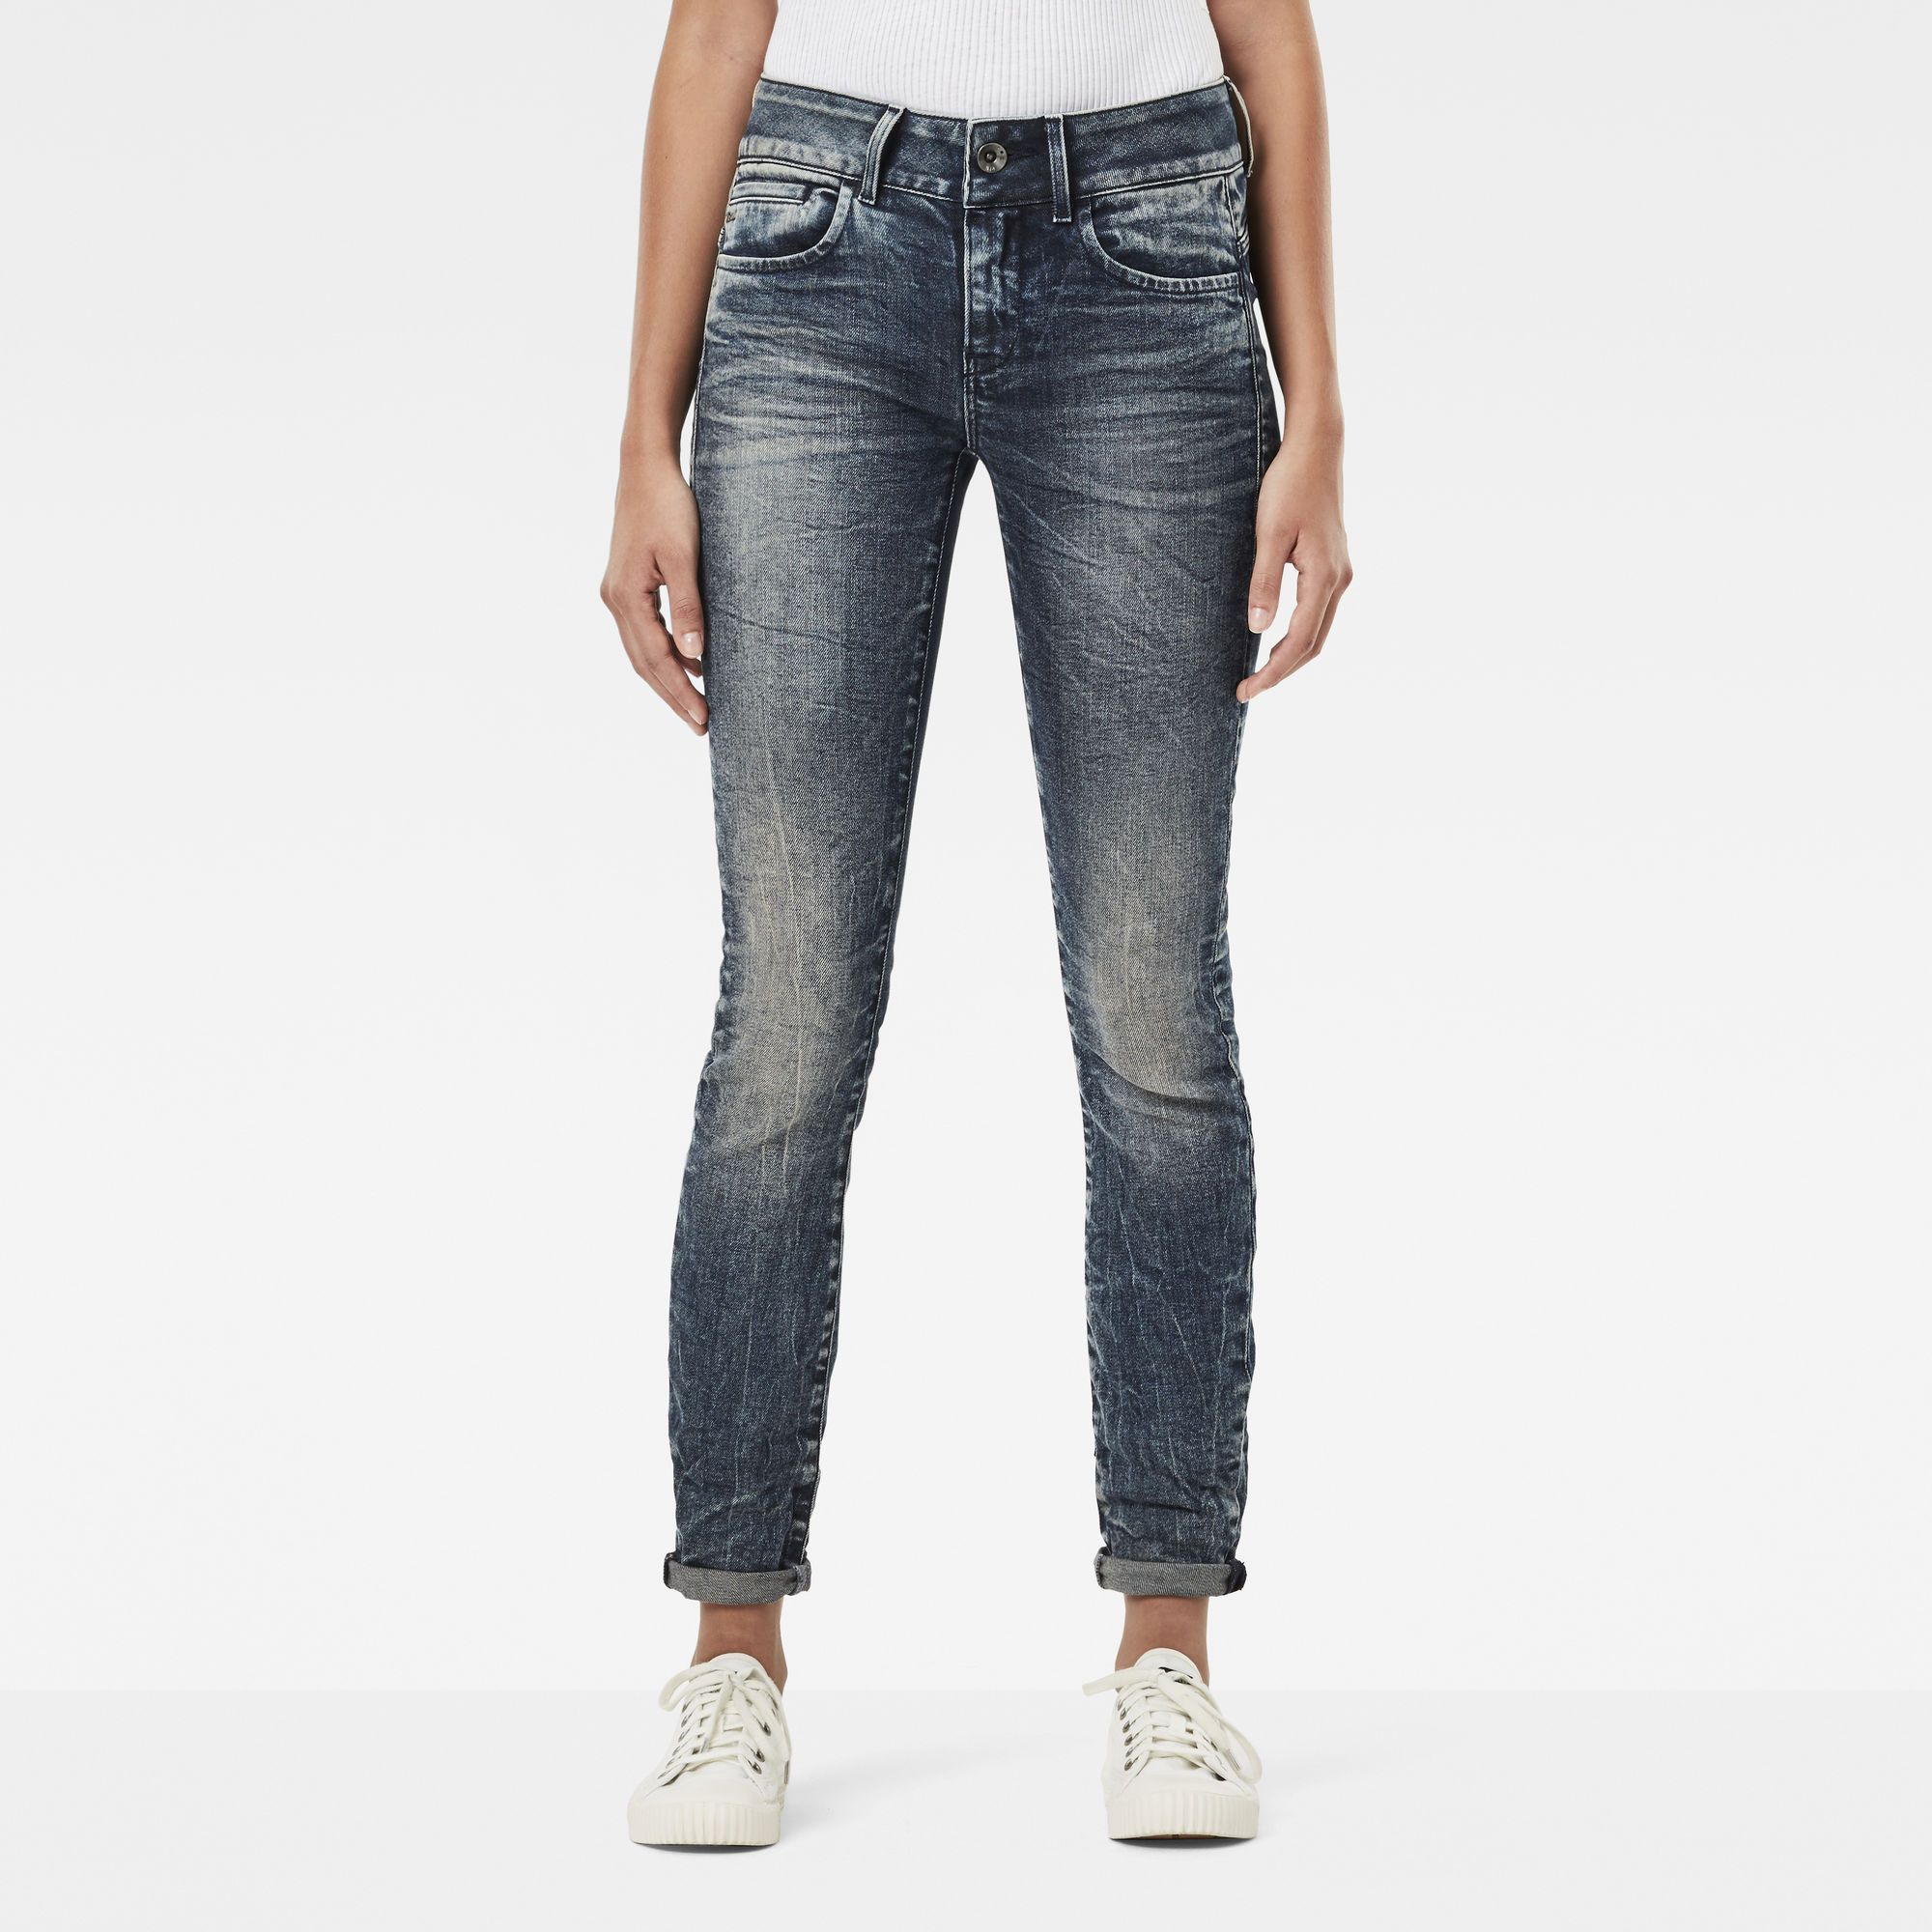 G-Star RAW Midge D-Cody Mid Waist Skinny Jeans